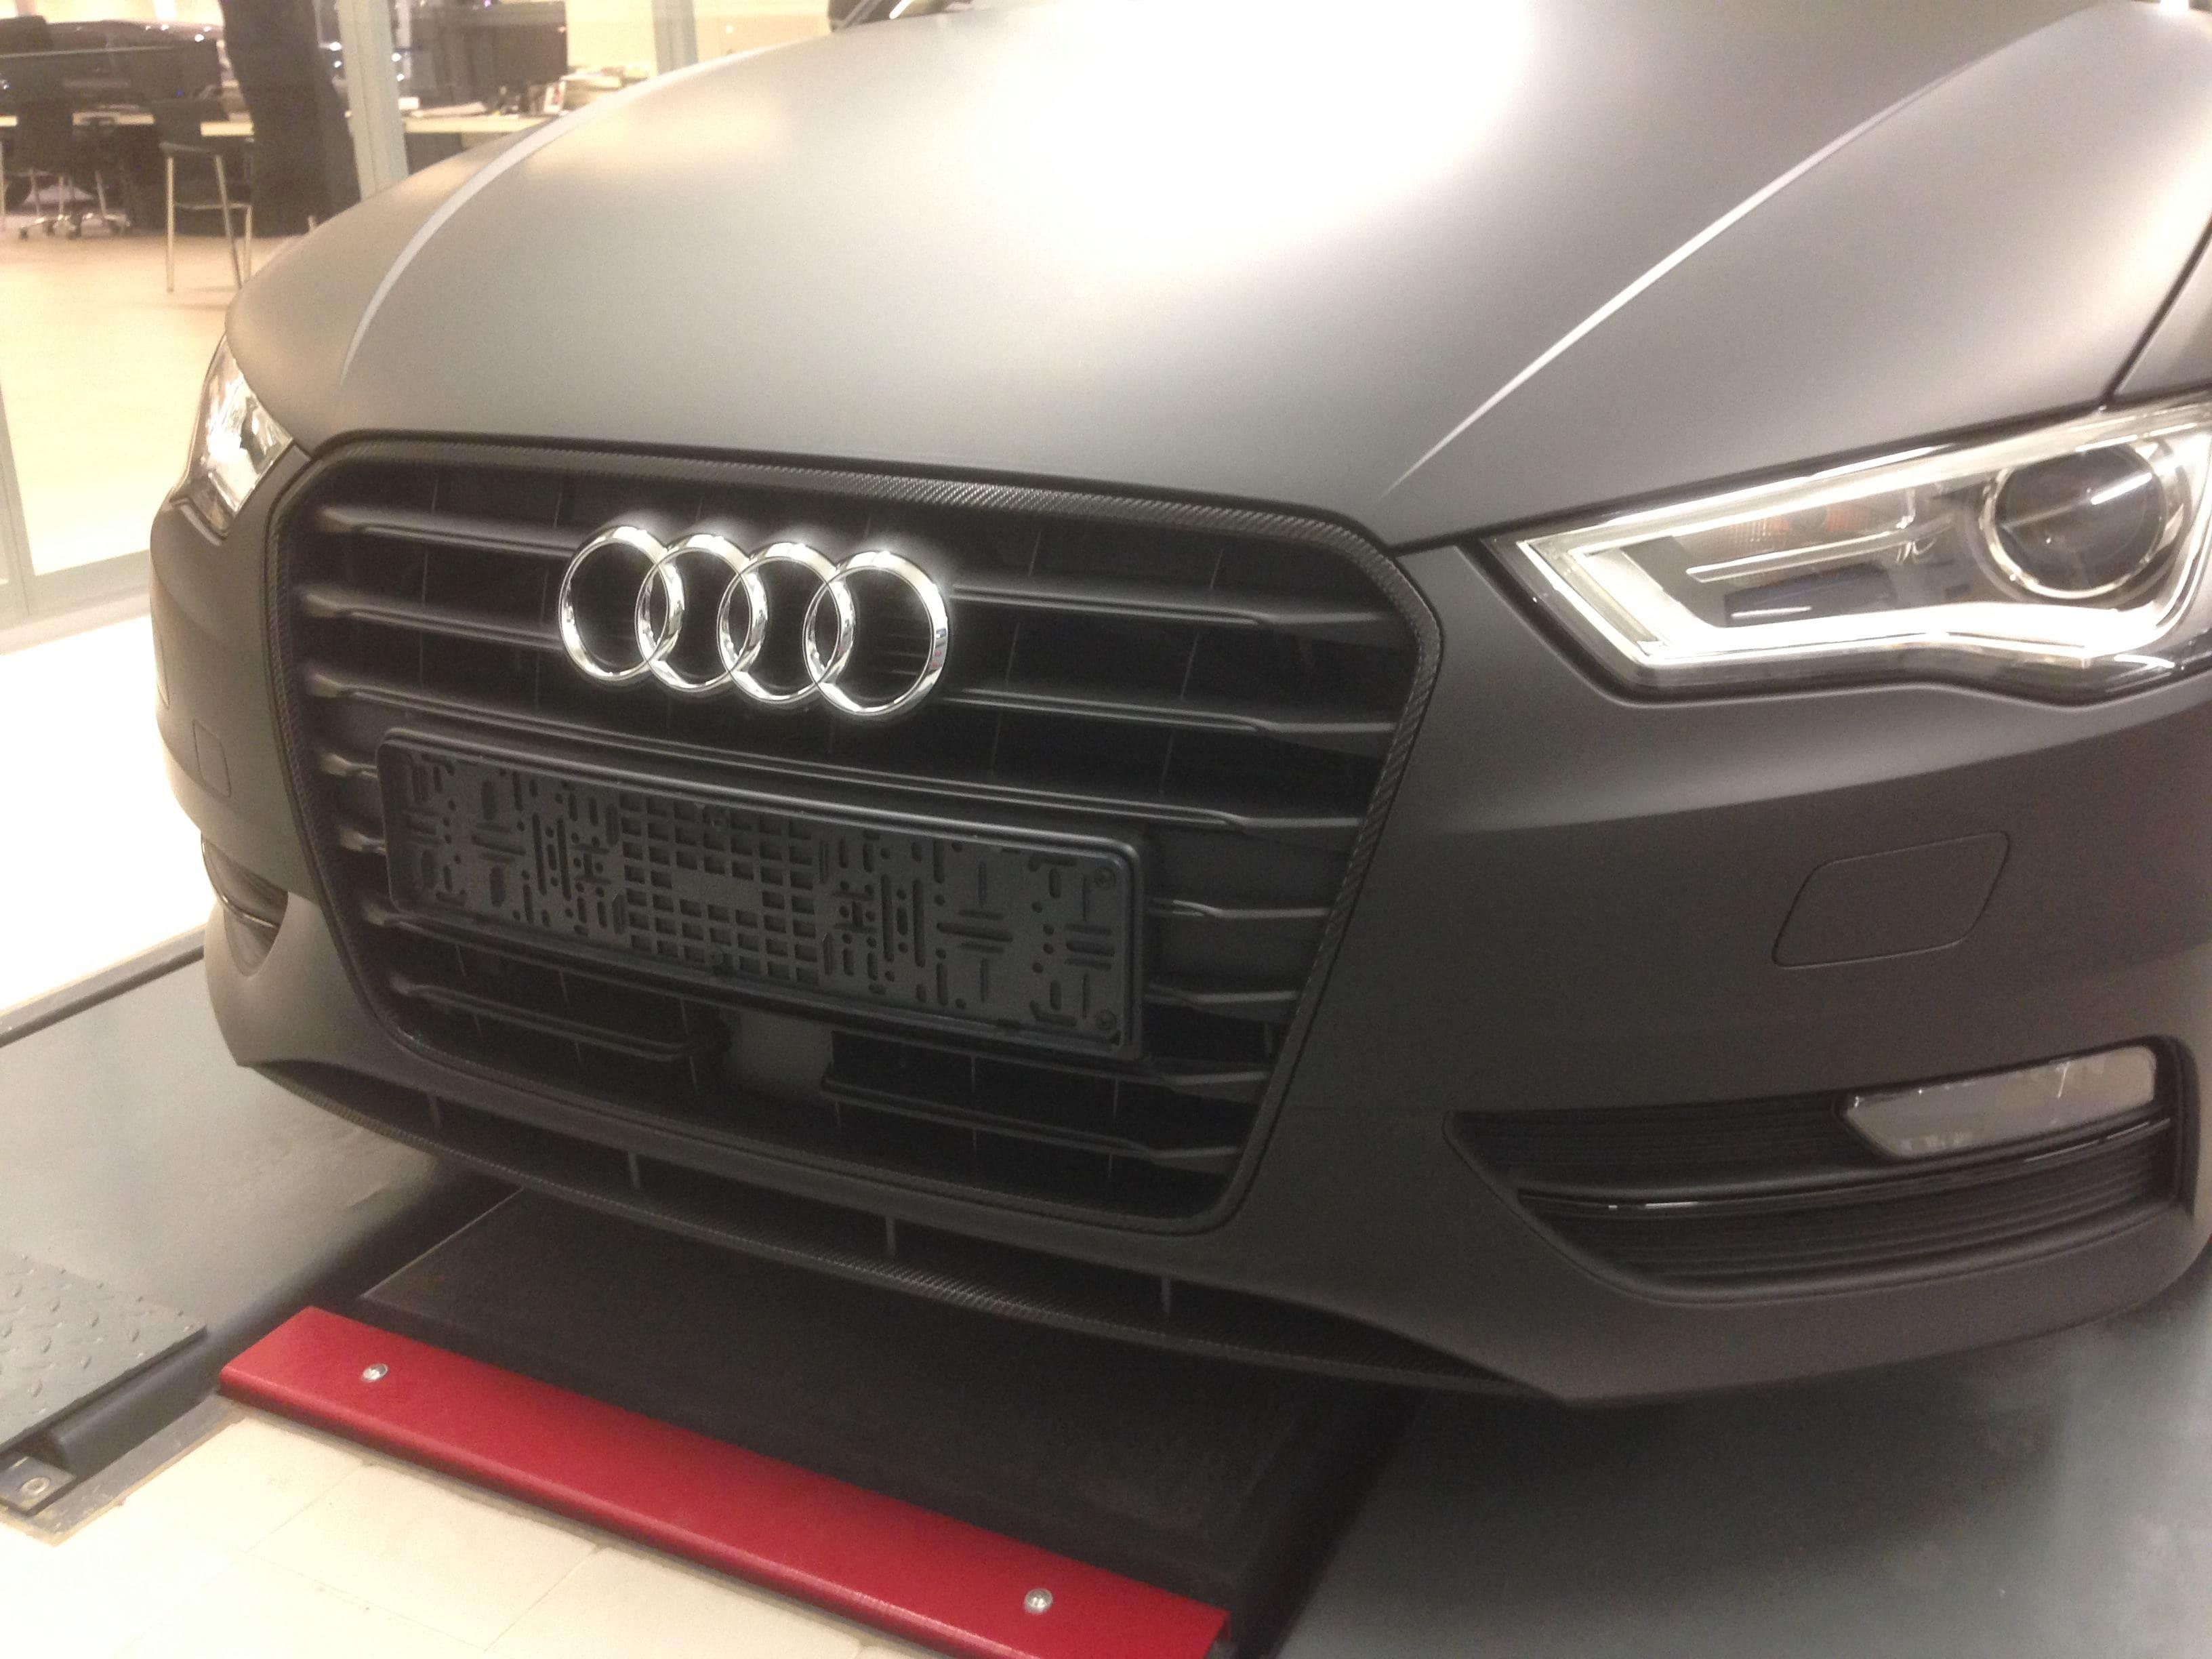 Audi A3 2014 met Mat Zwarte Wrap, Carwrapping door Wrapmyride.nu Foto-nr:4469, ©2021